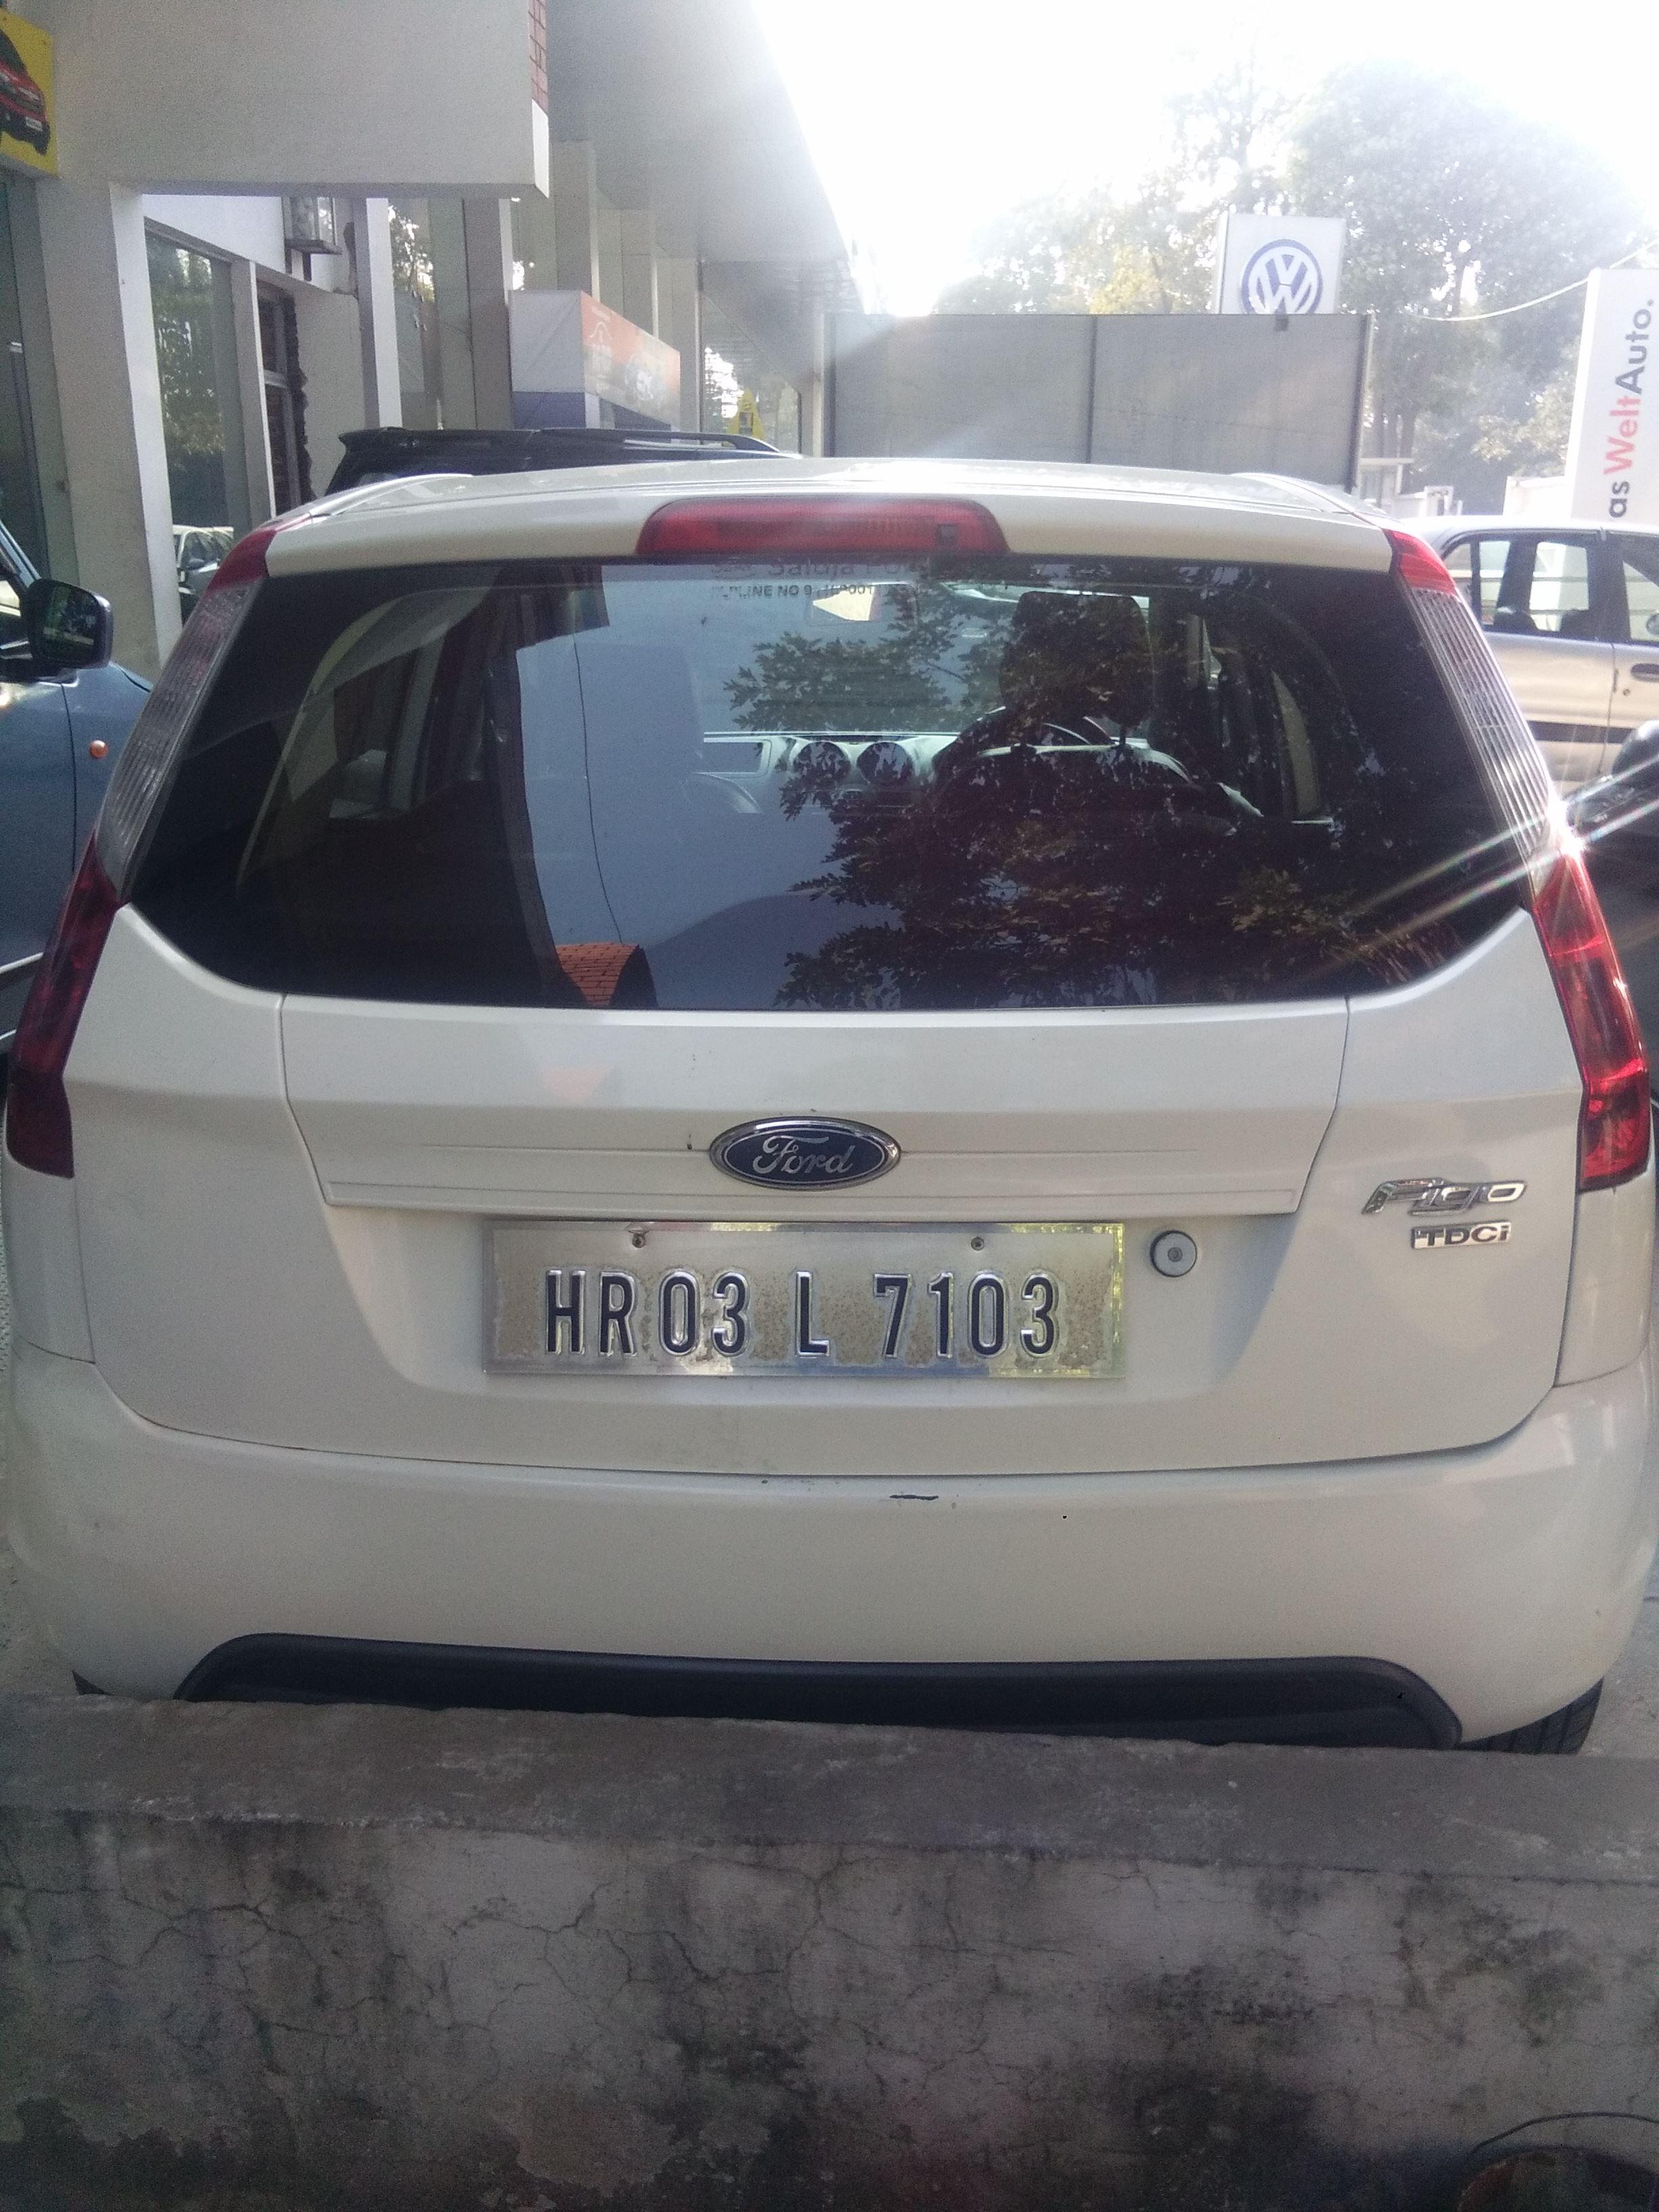 2010 Used Ford Figo LXI DURATORQ 1.4